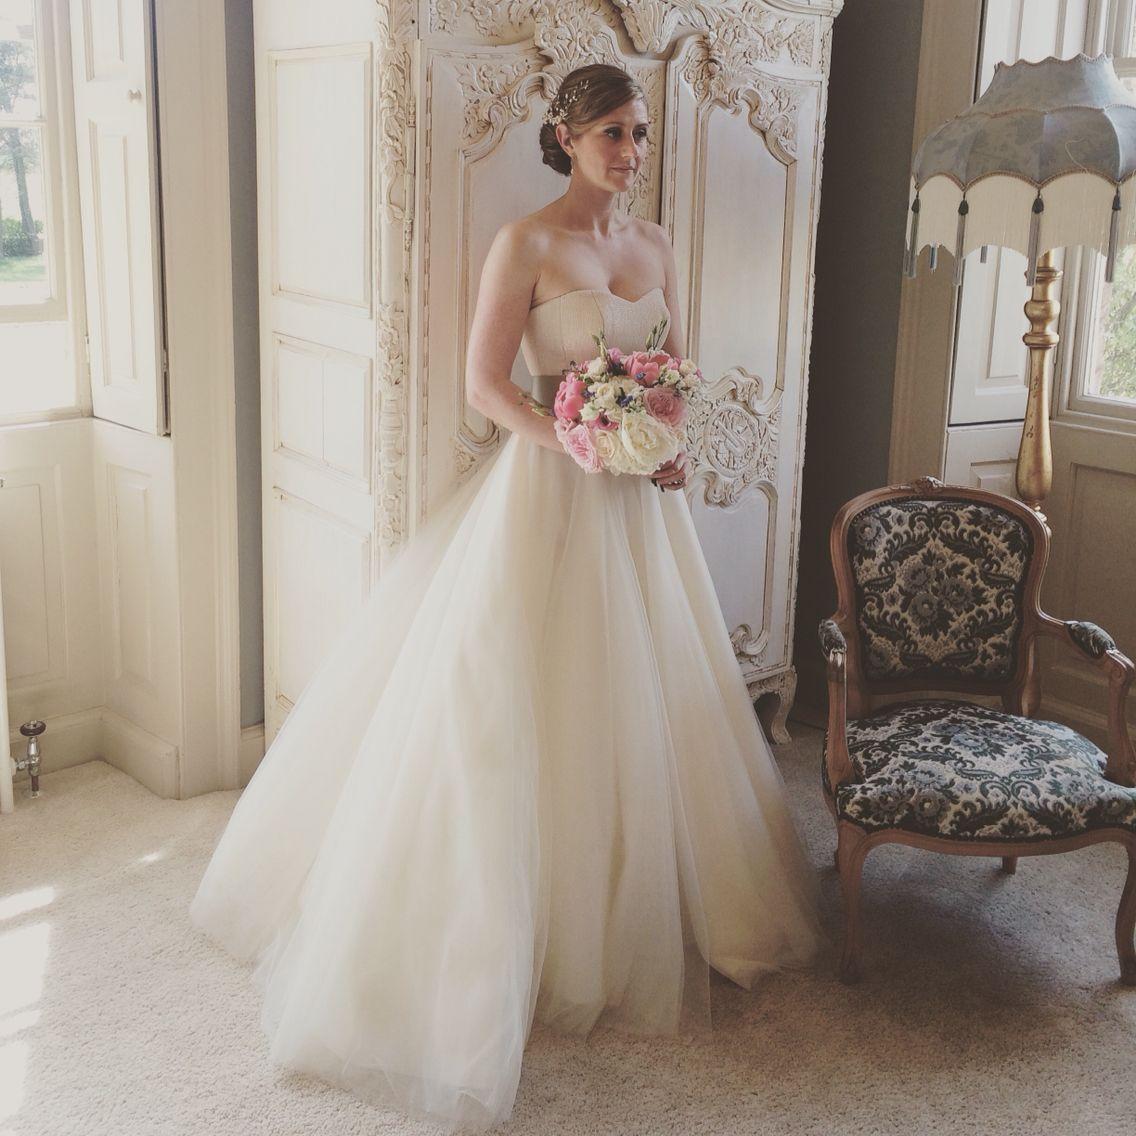 newton hall wedding hairdresser lisa cameron hair bride